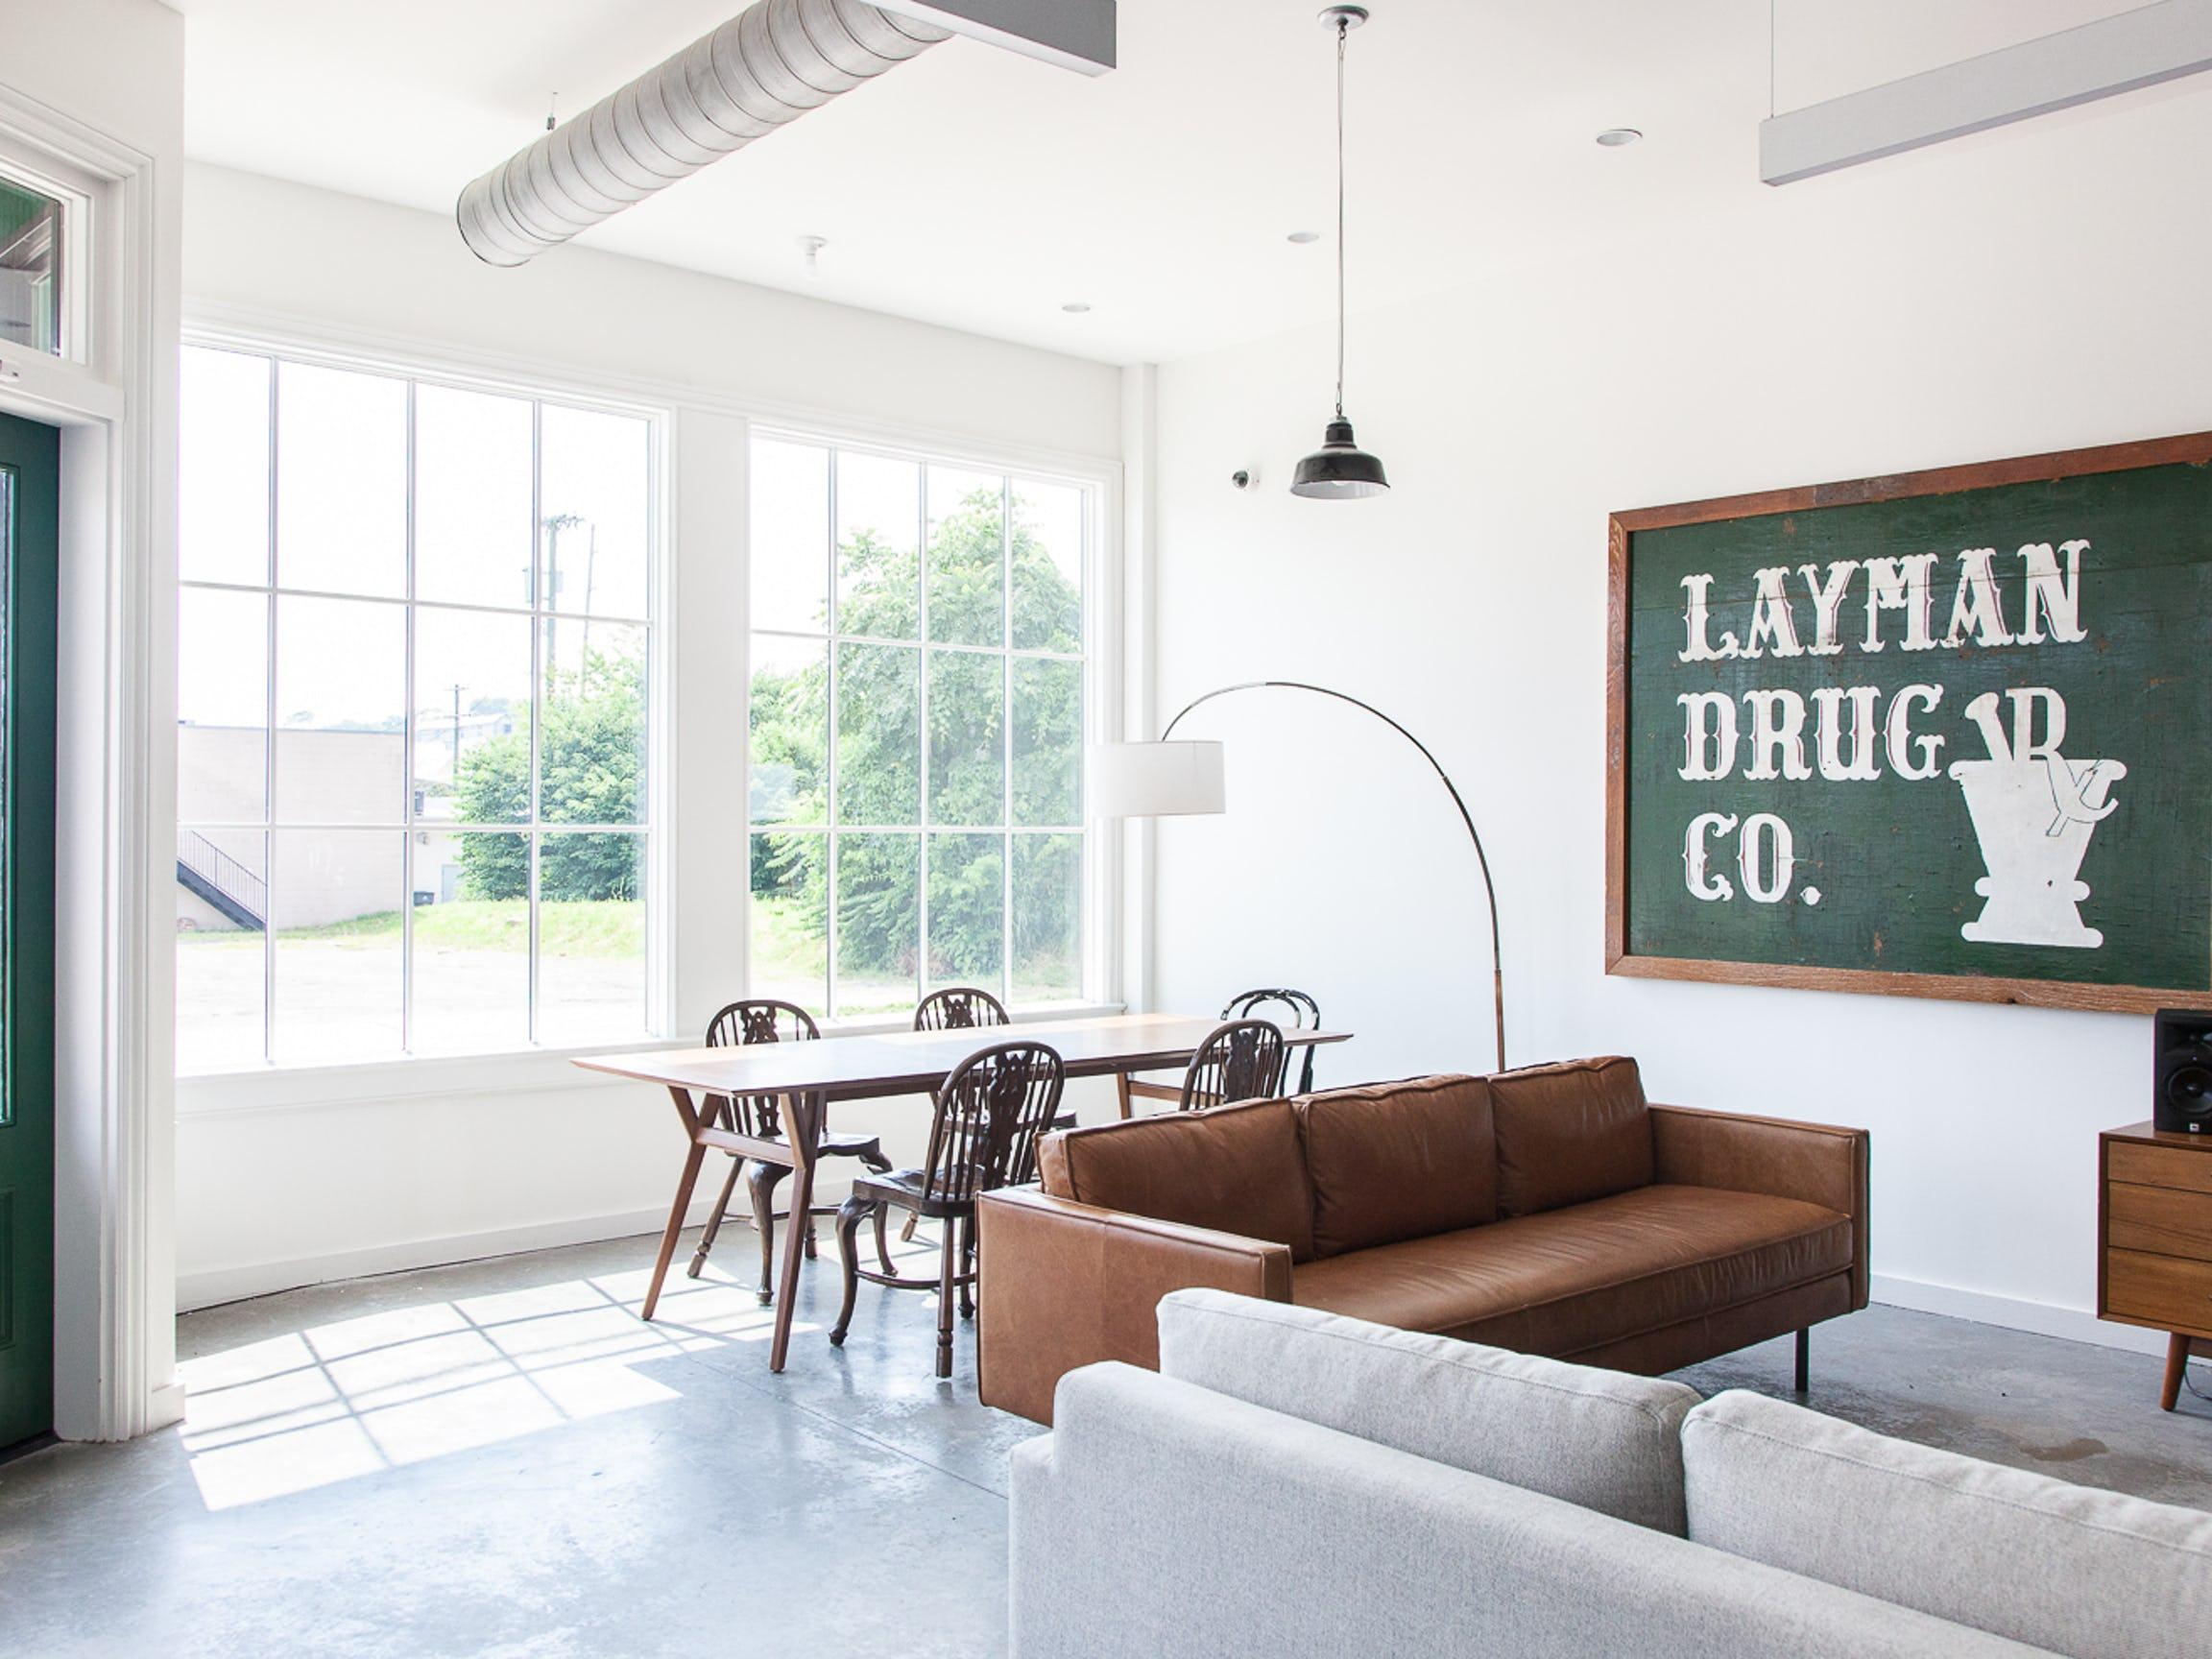 Layman Drug Company: Studio, Band Rehearsal Space, And Venue - AVVAY